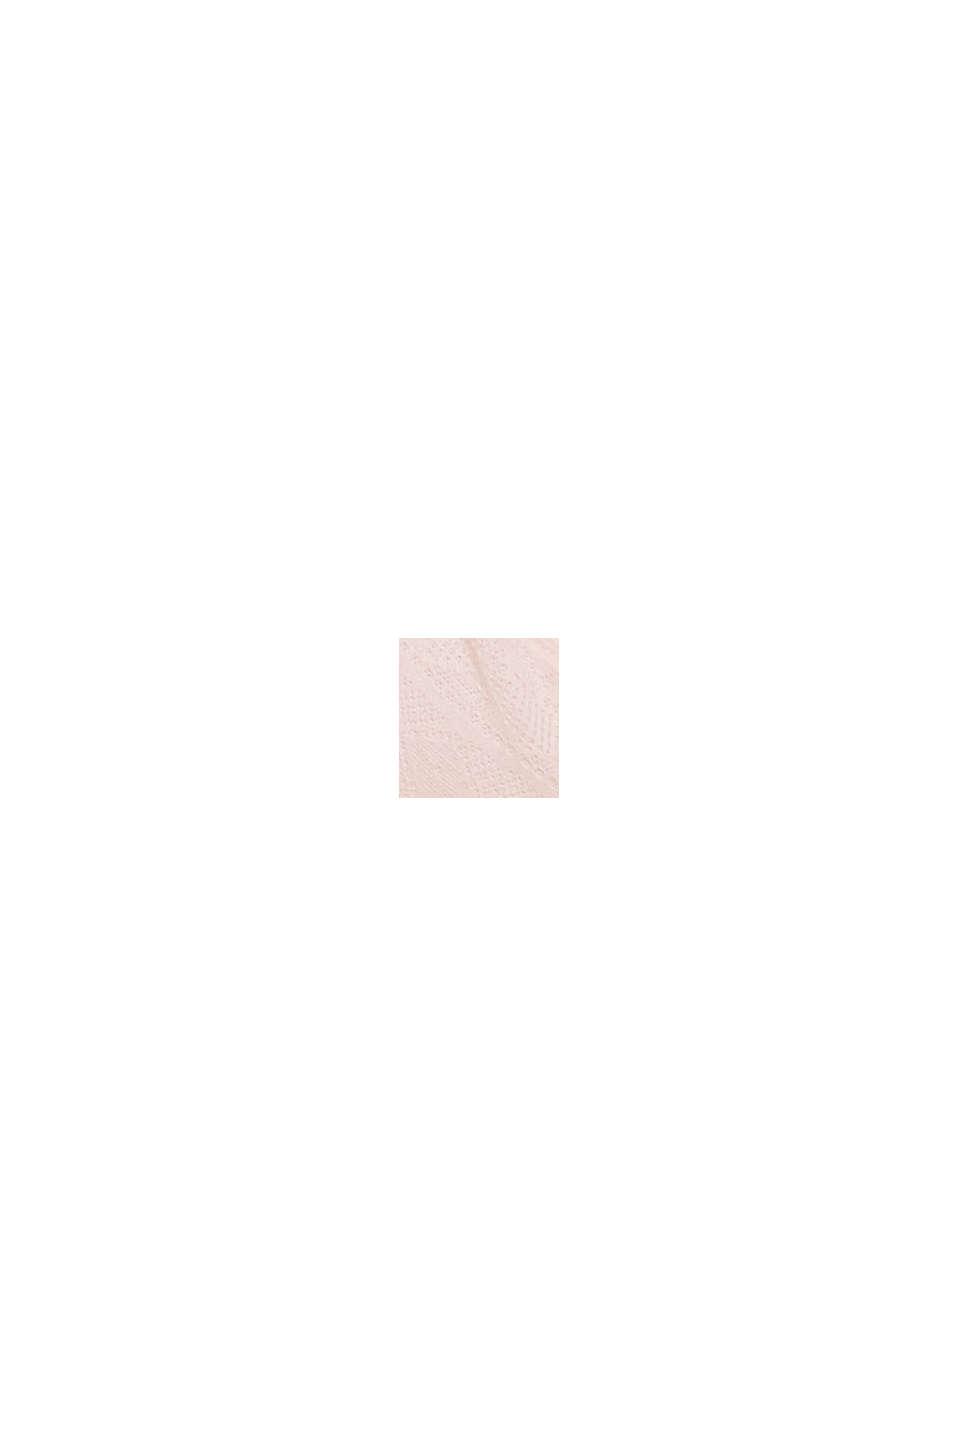 Sujetador de encaje sin relleno, LIGHT PINK, swatch